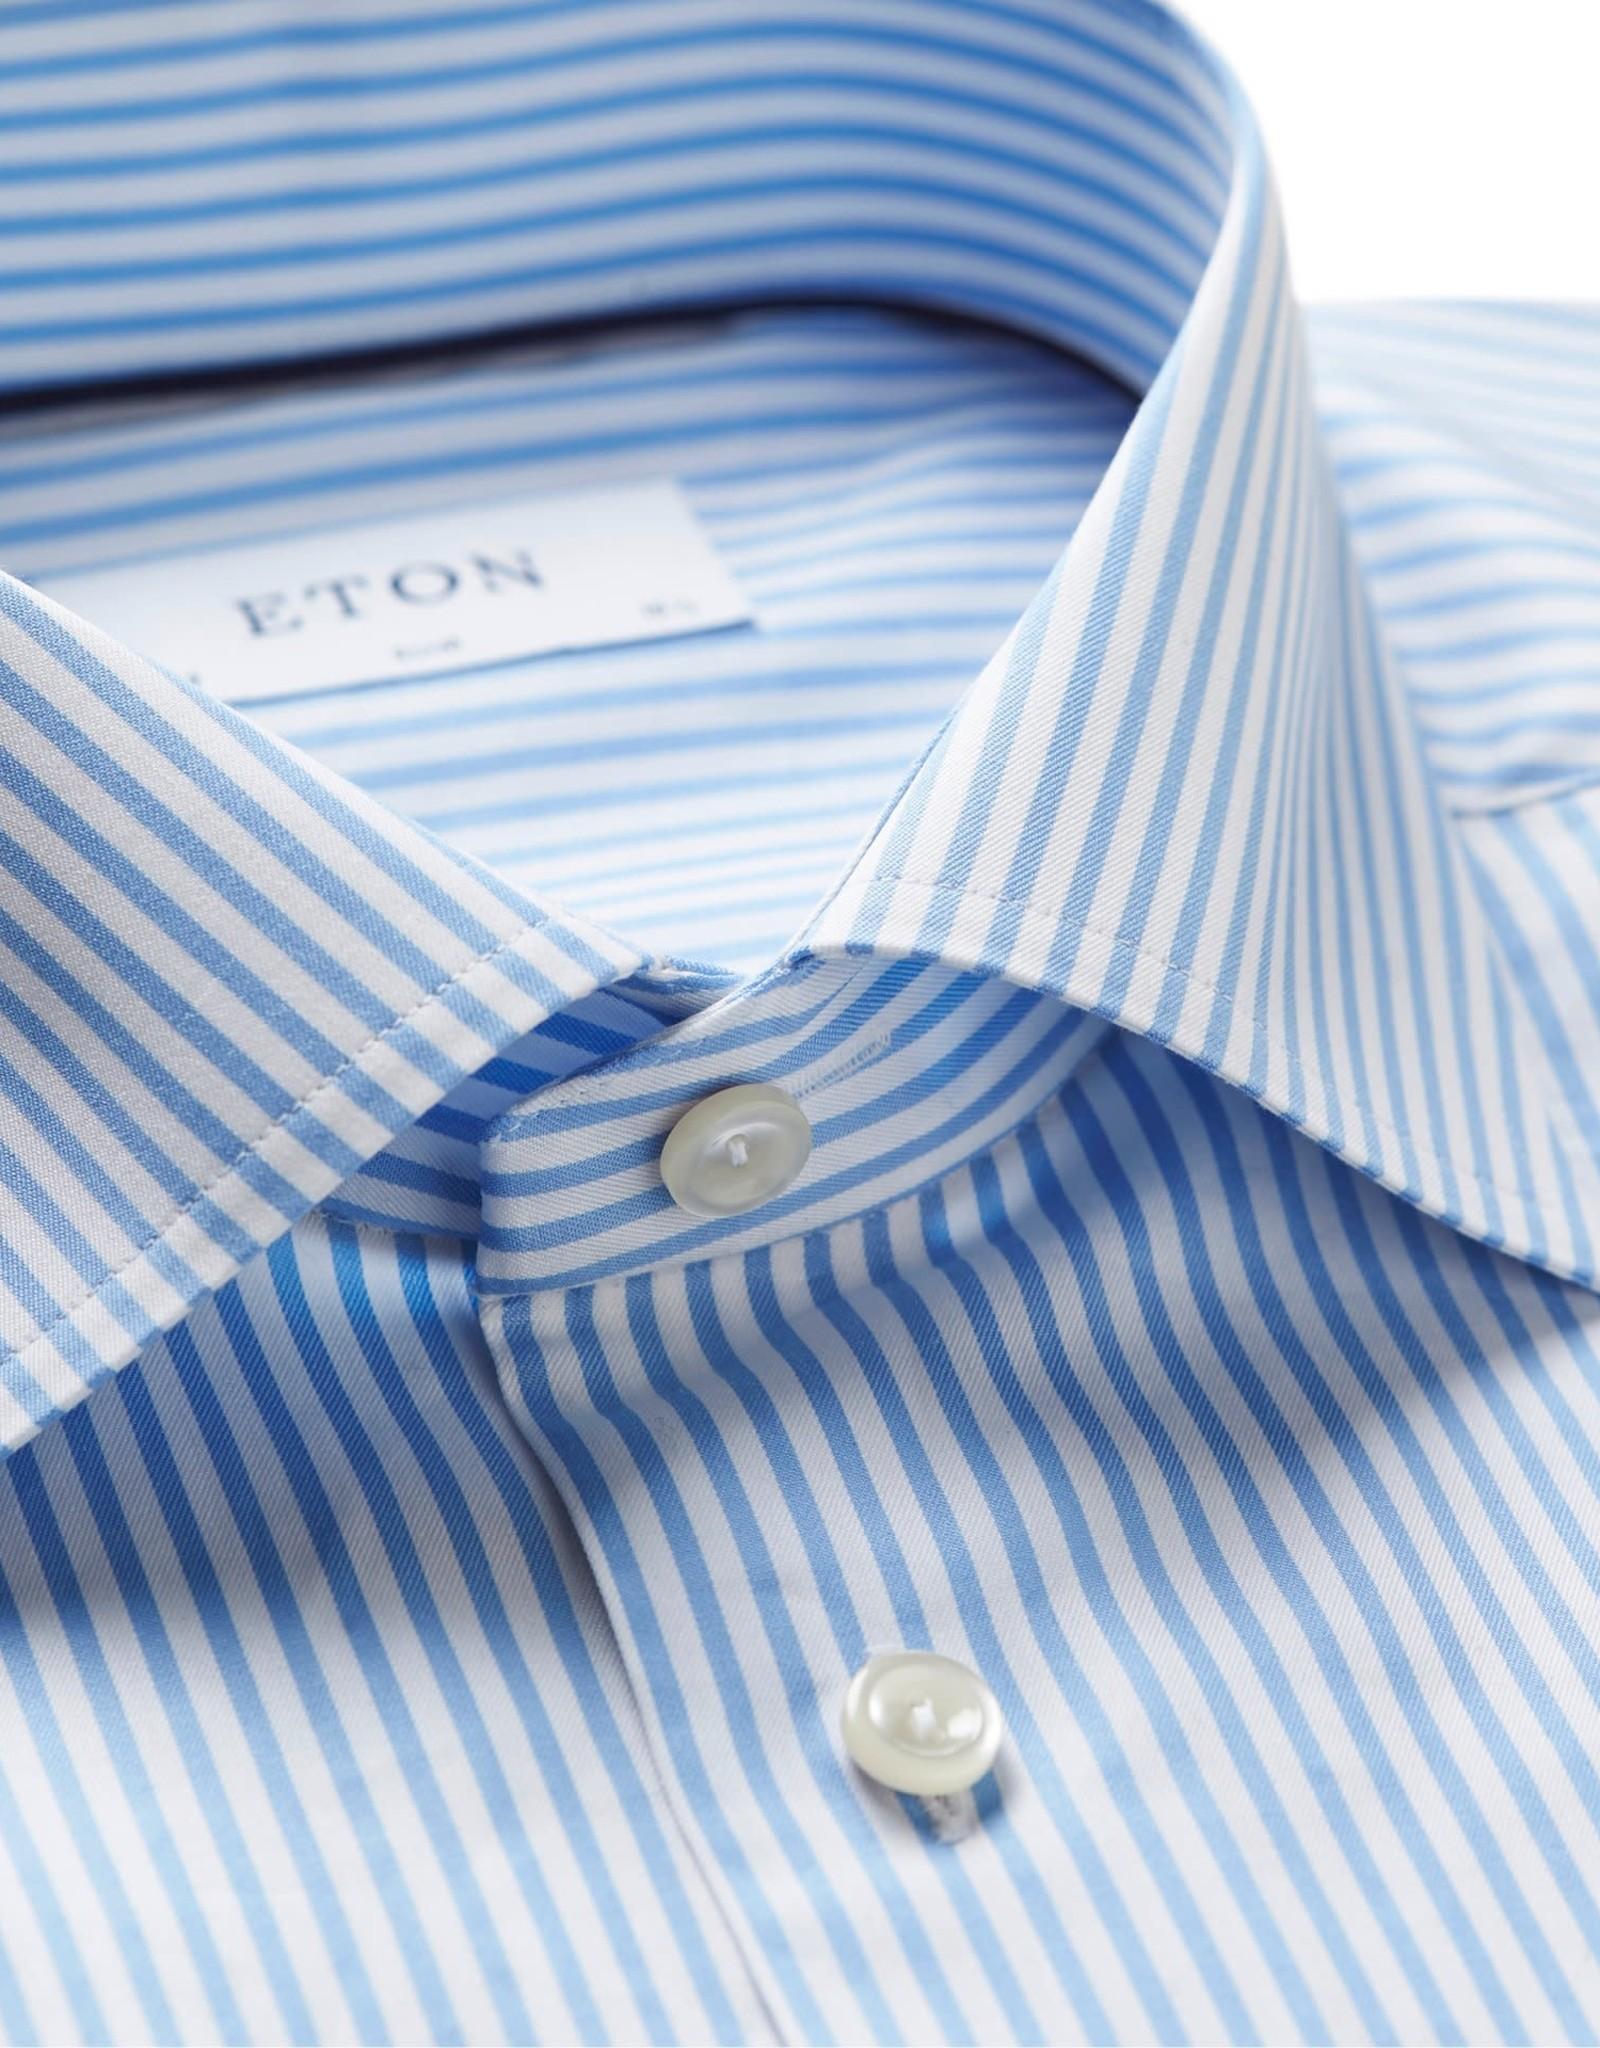 Eton Eton hemd blauw slim 3082-79511/22